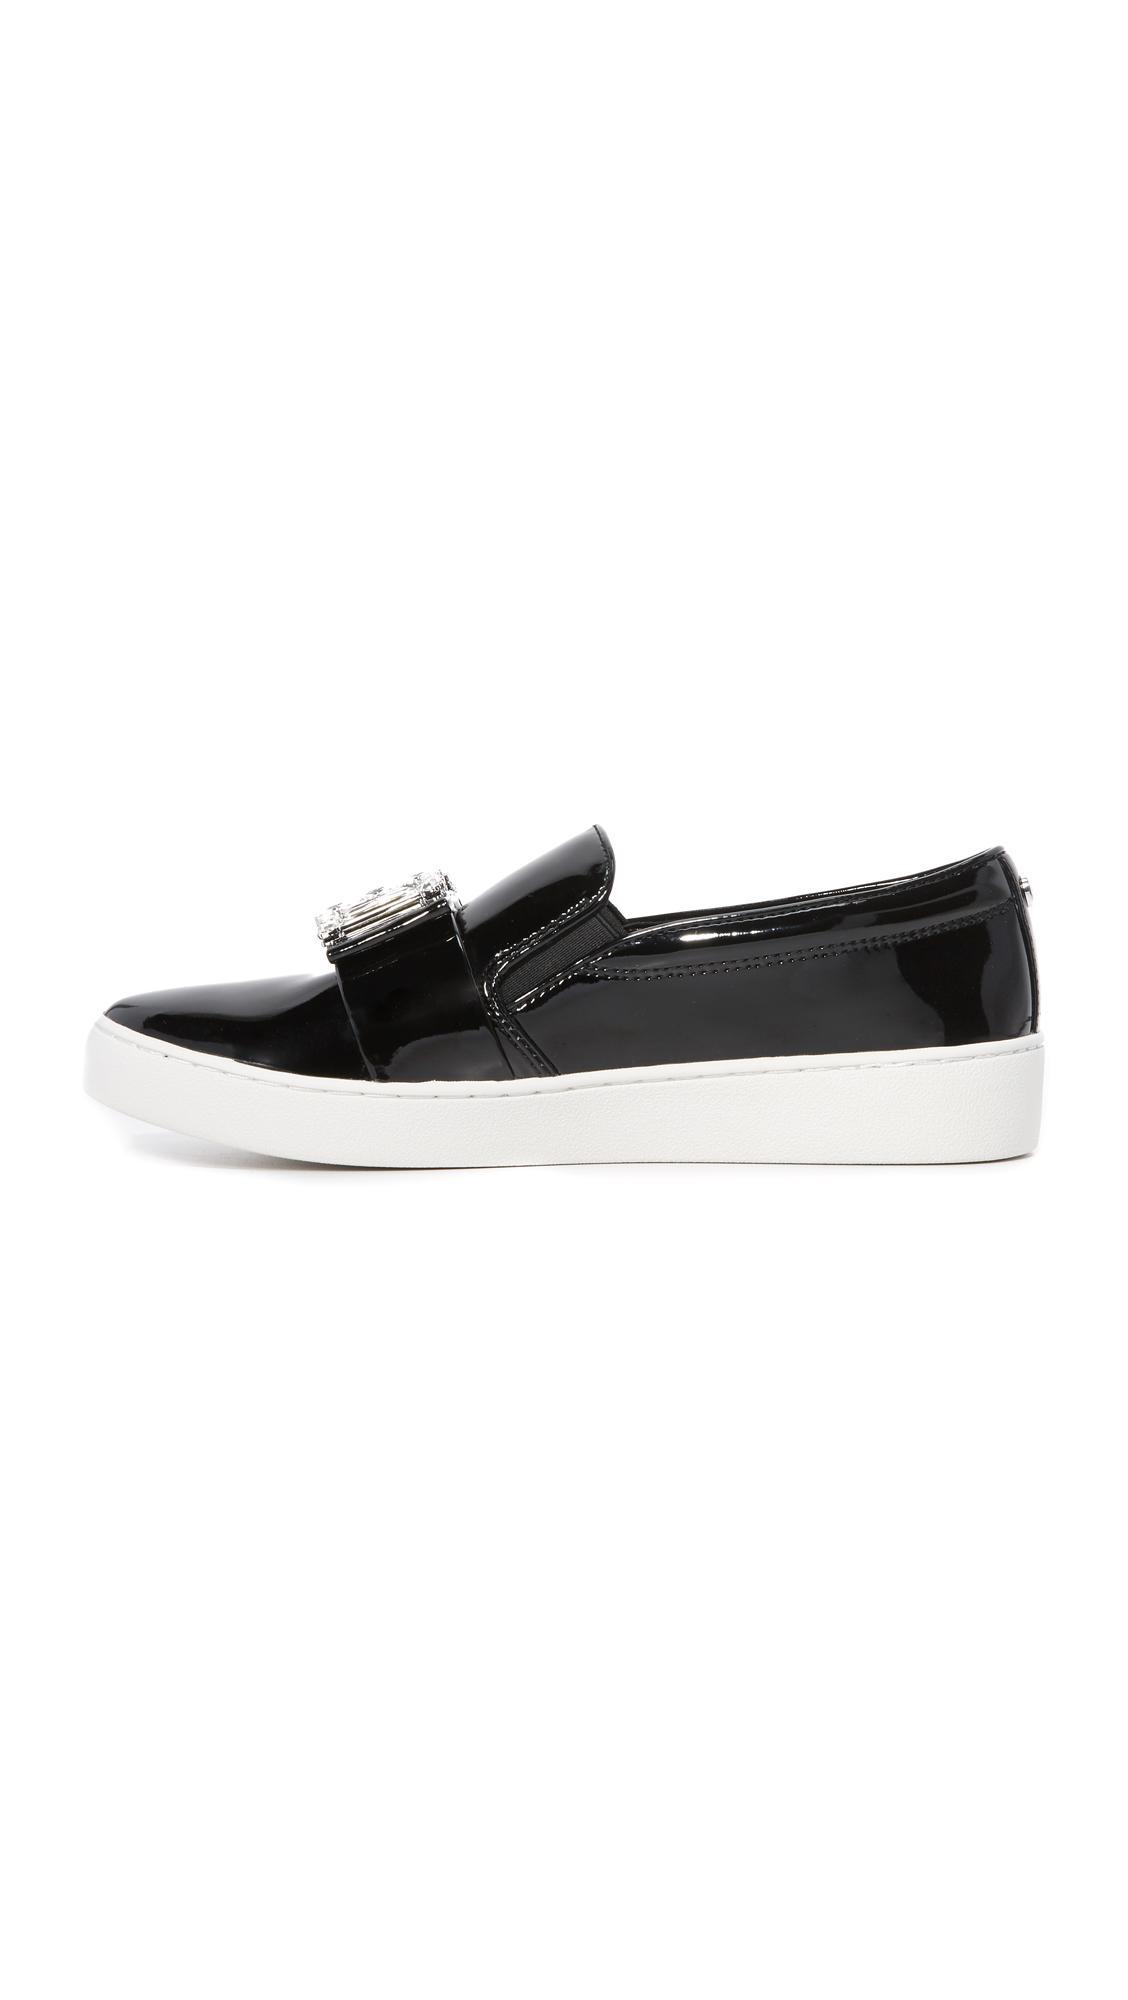 MICHAEL Michael Kors Michelle Slip On Sneakers in Black